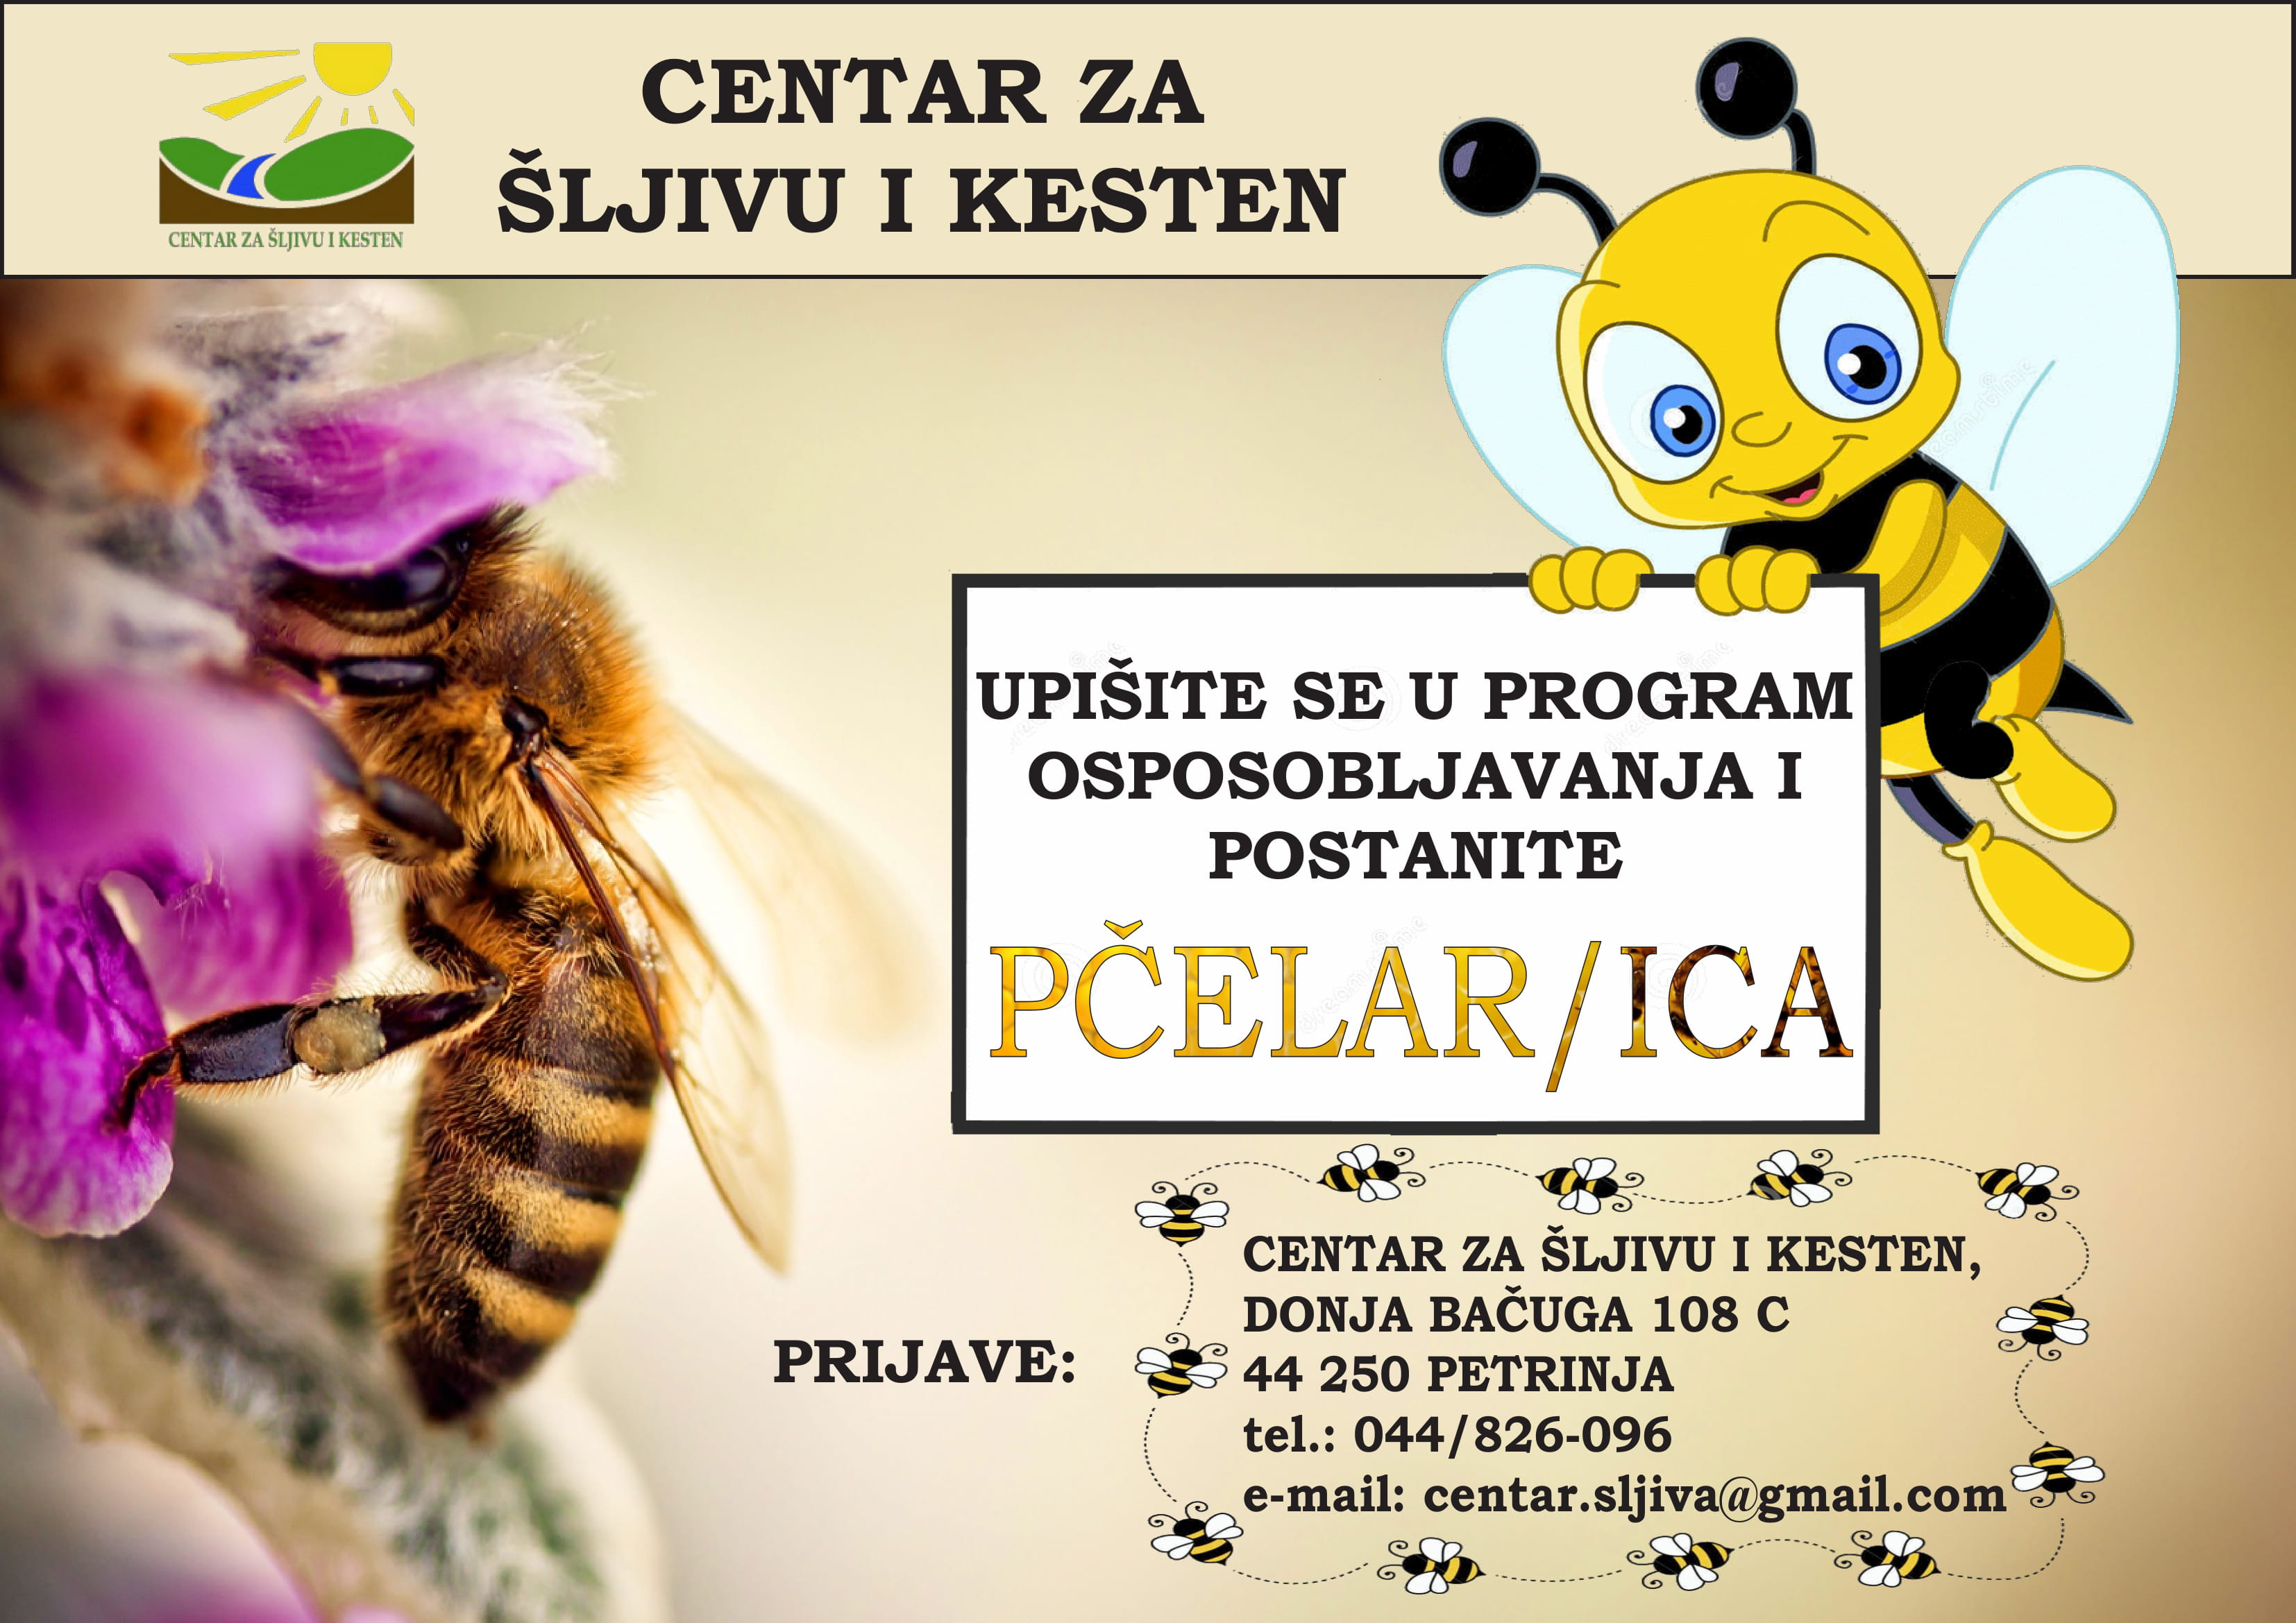 Upišite se u program osposobljavanja i postanite – PČELAR